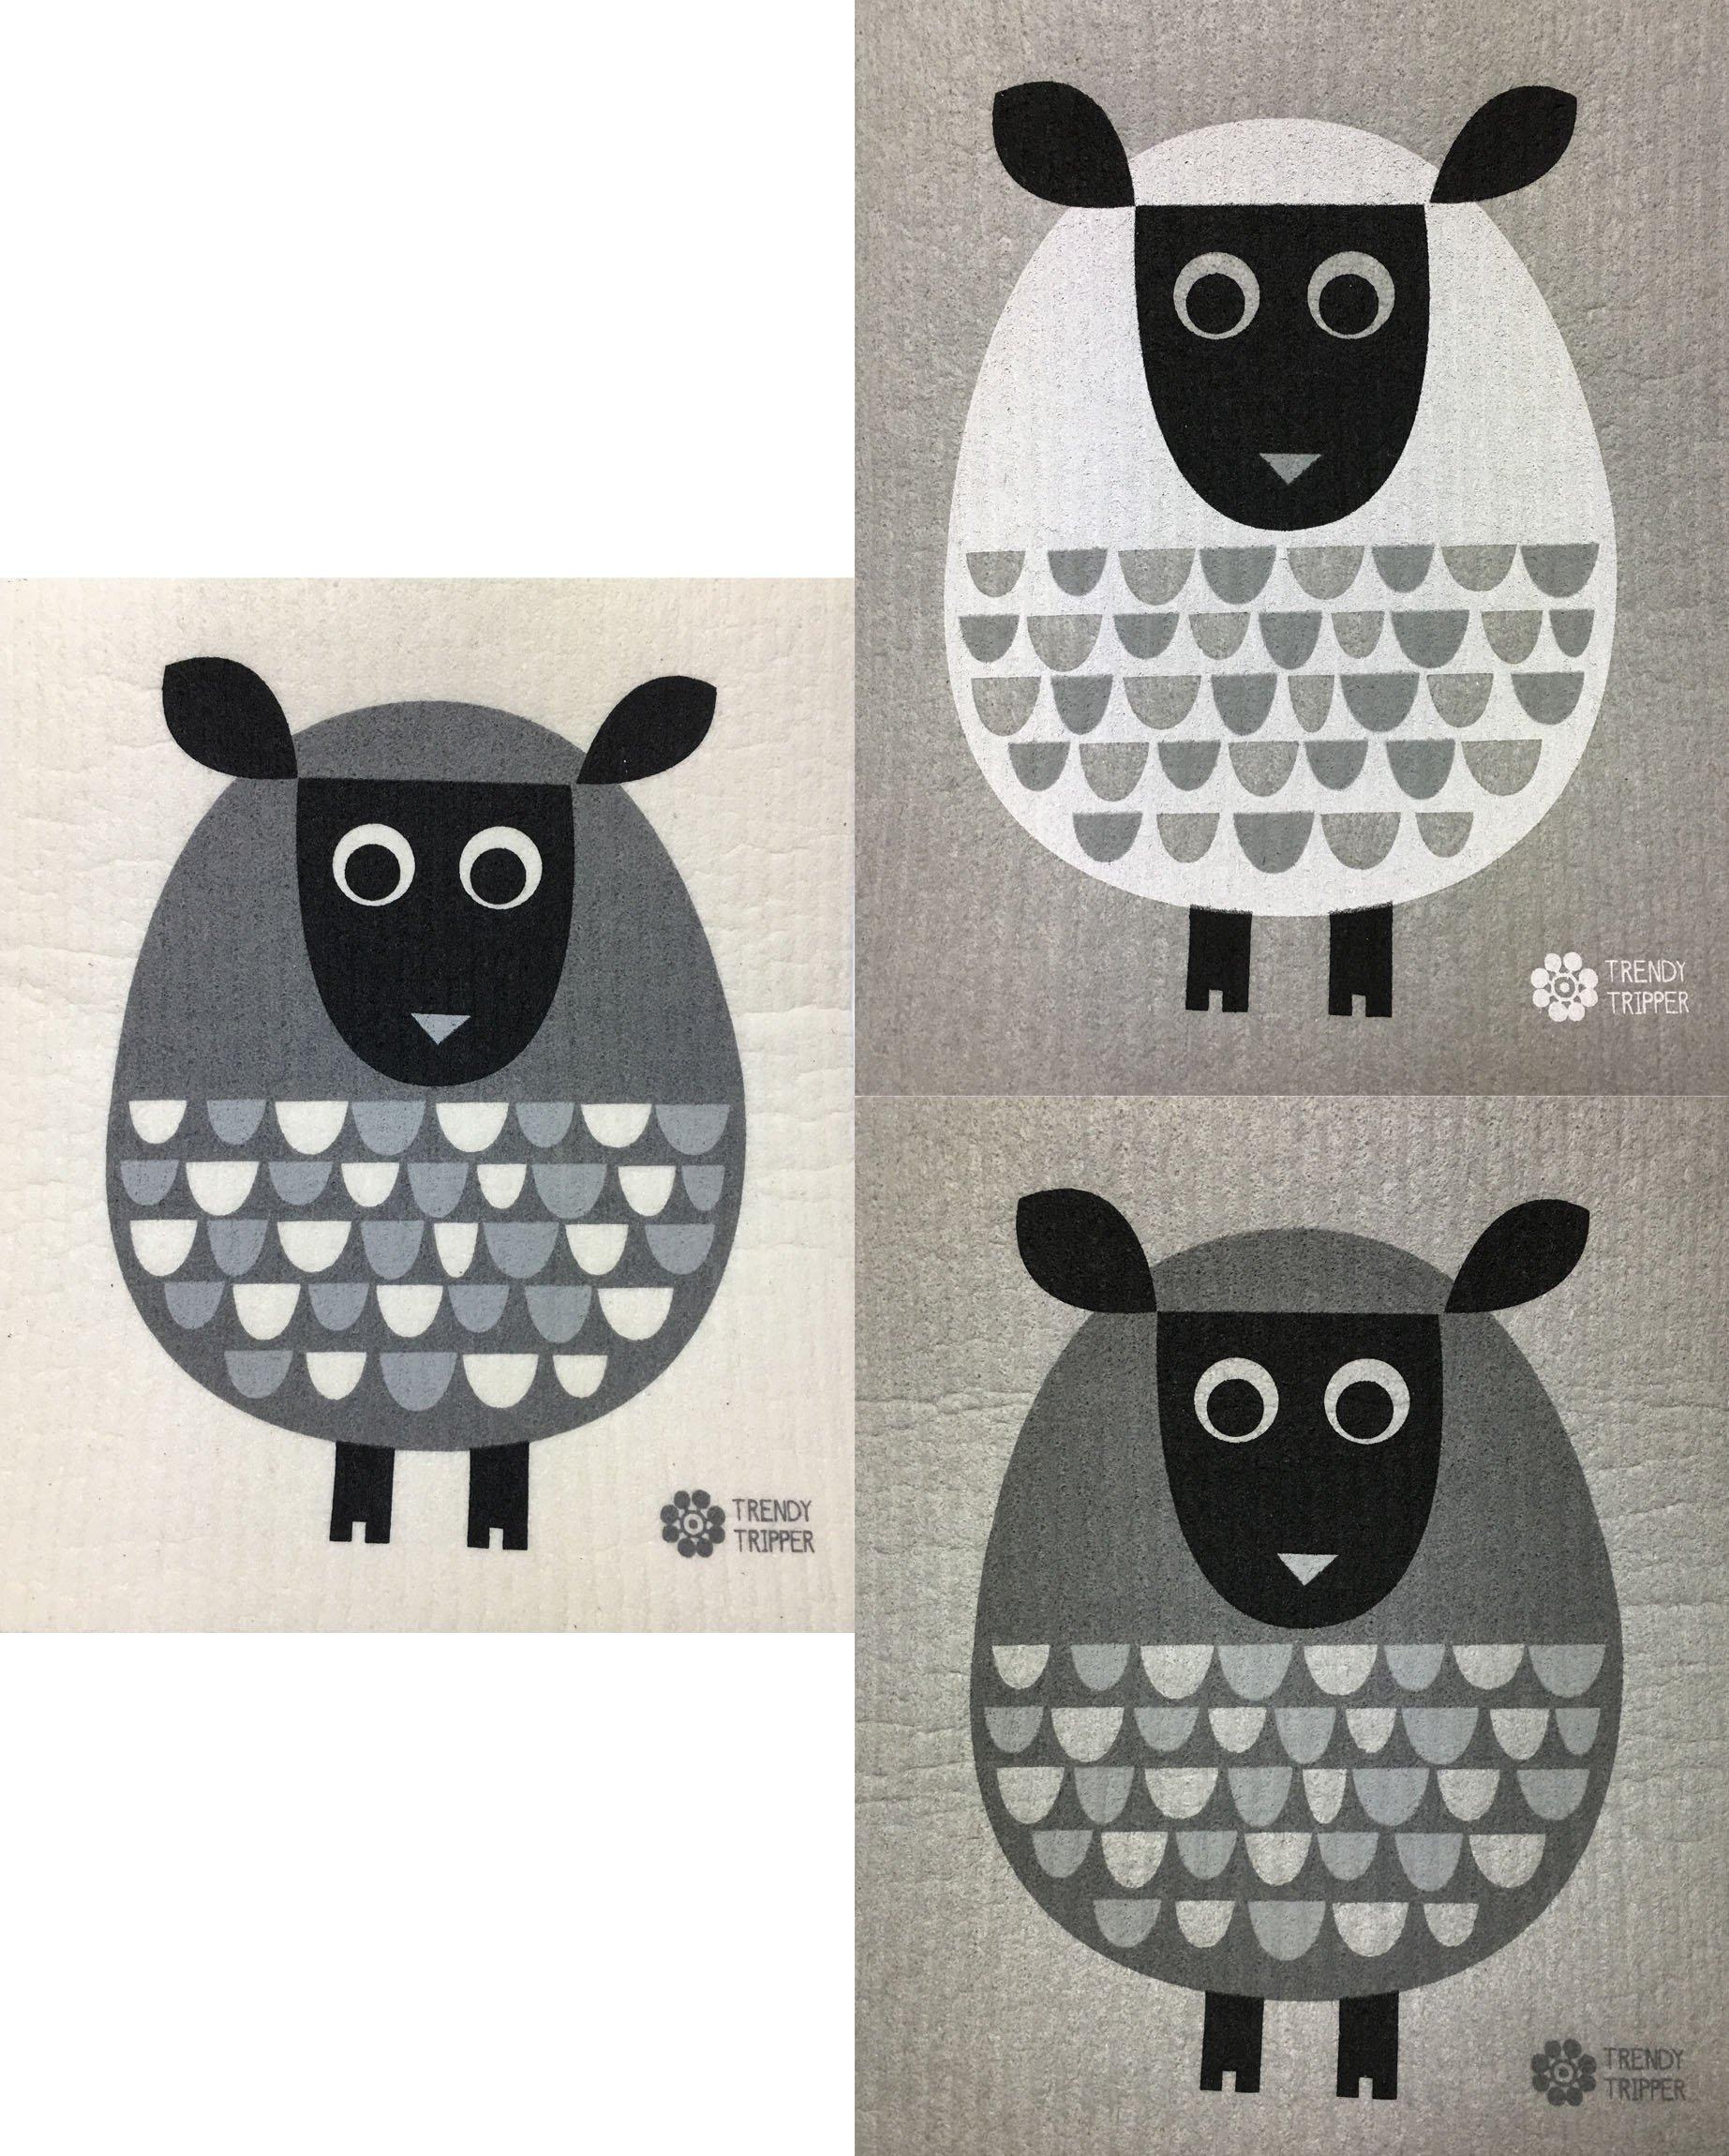 Trendy Tripper Reusable Swedish Dishcloths: Jenn Ski MODERN SHEEP: 1 GREY on GREY, 1 WHITE on GREY + 1 GREY on NATURAL (Set of 3)